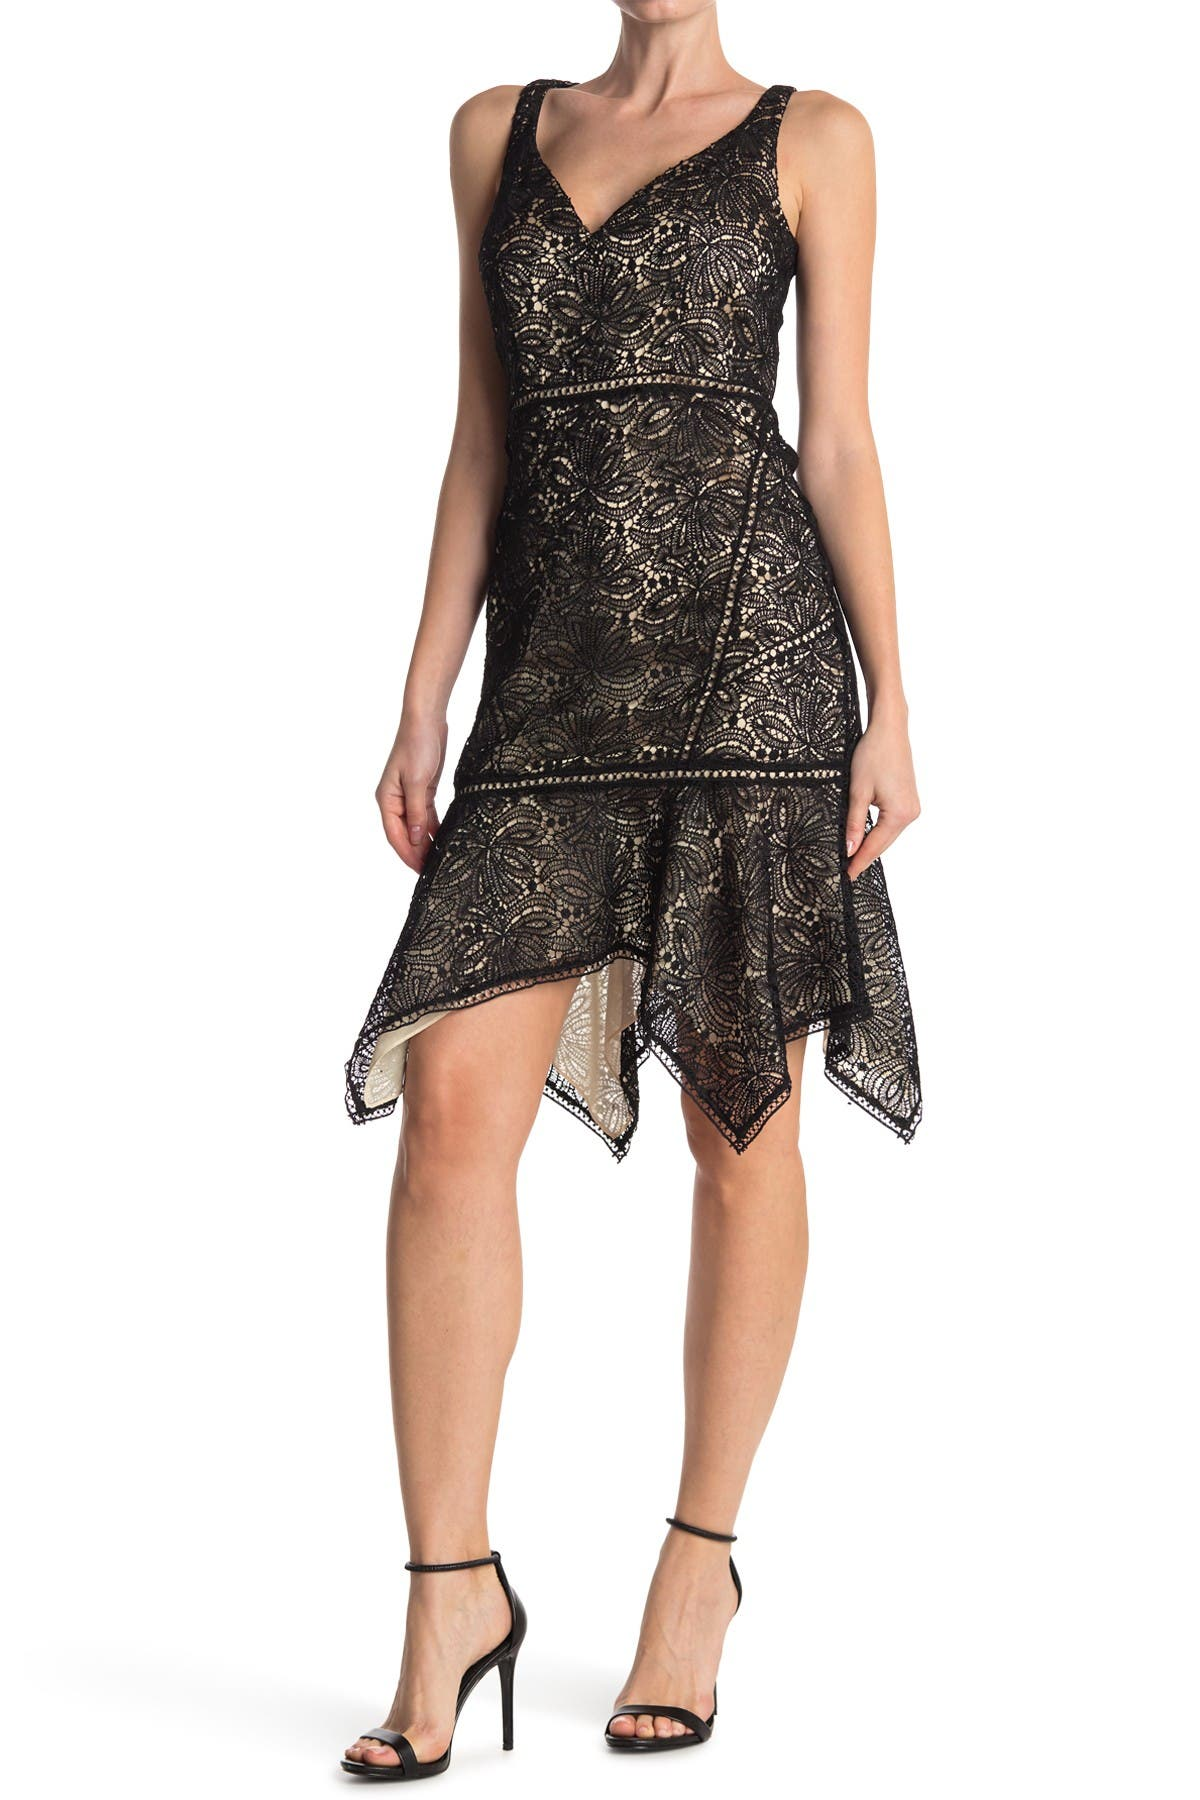 Image of Elie Tahari Mariya Handkerchief Hem Lace Dress